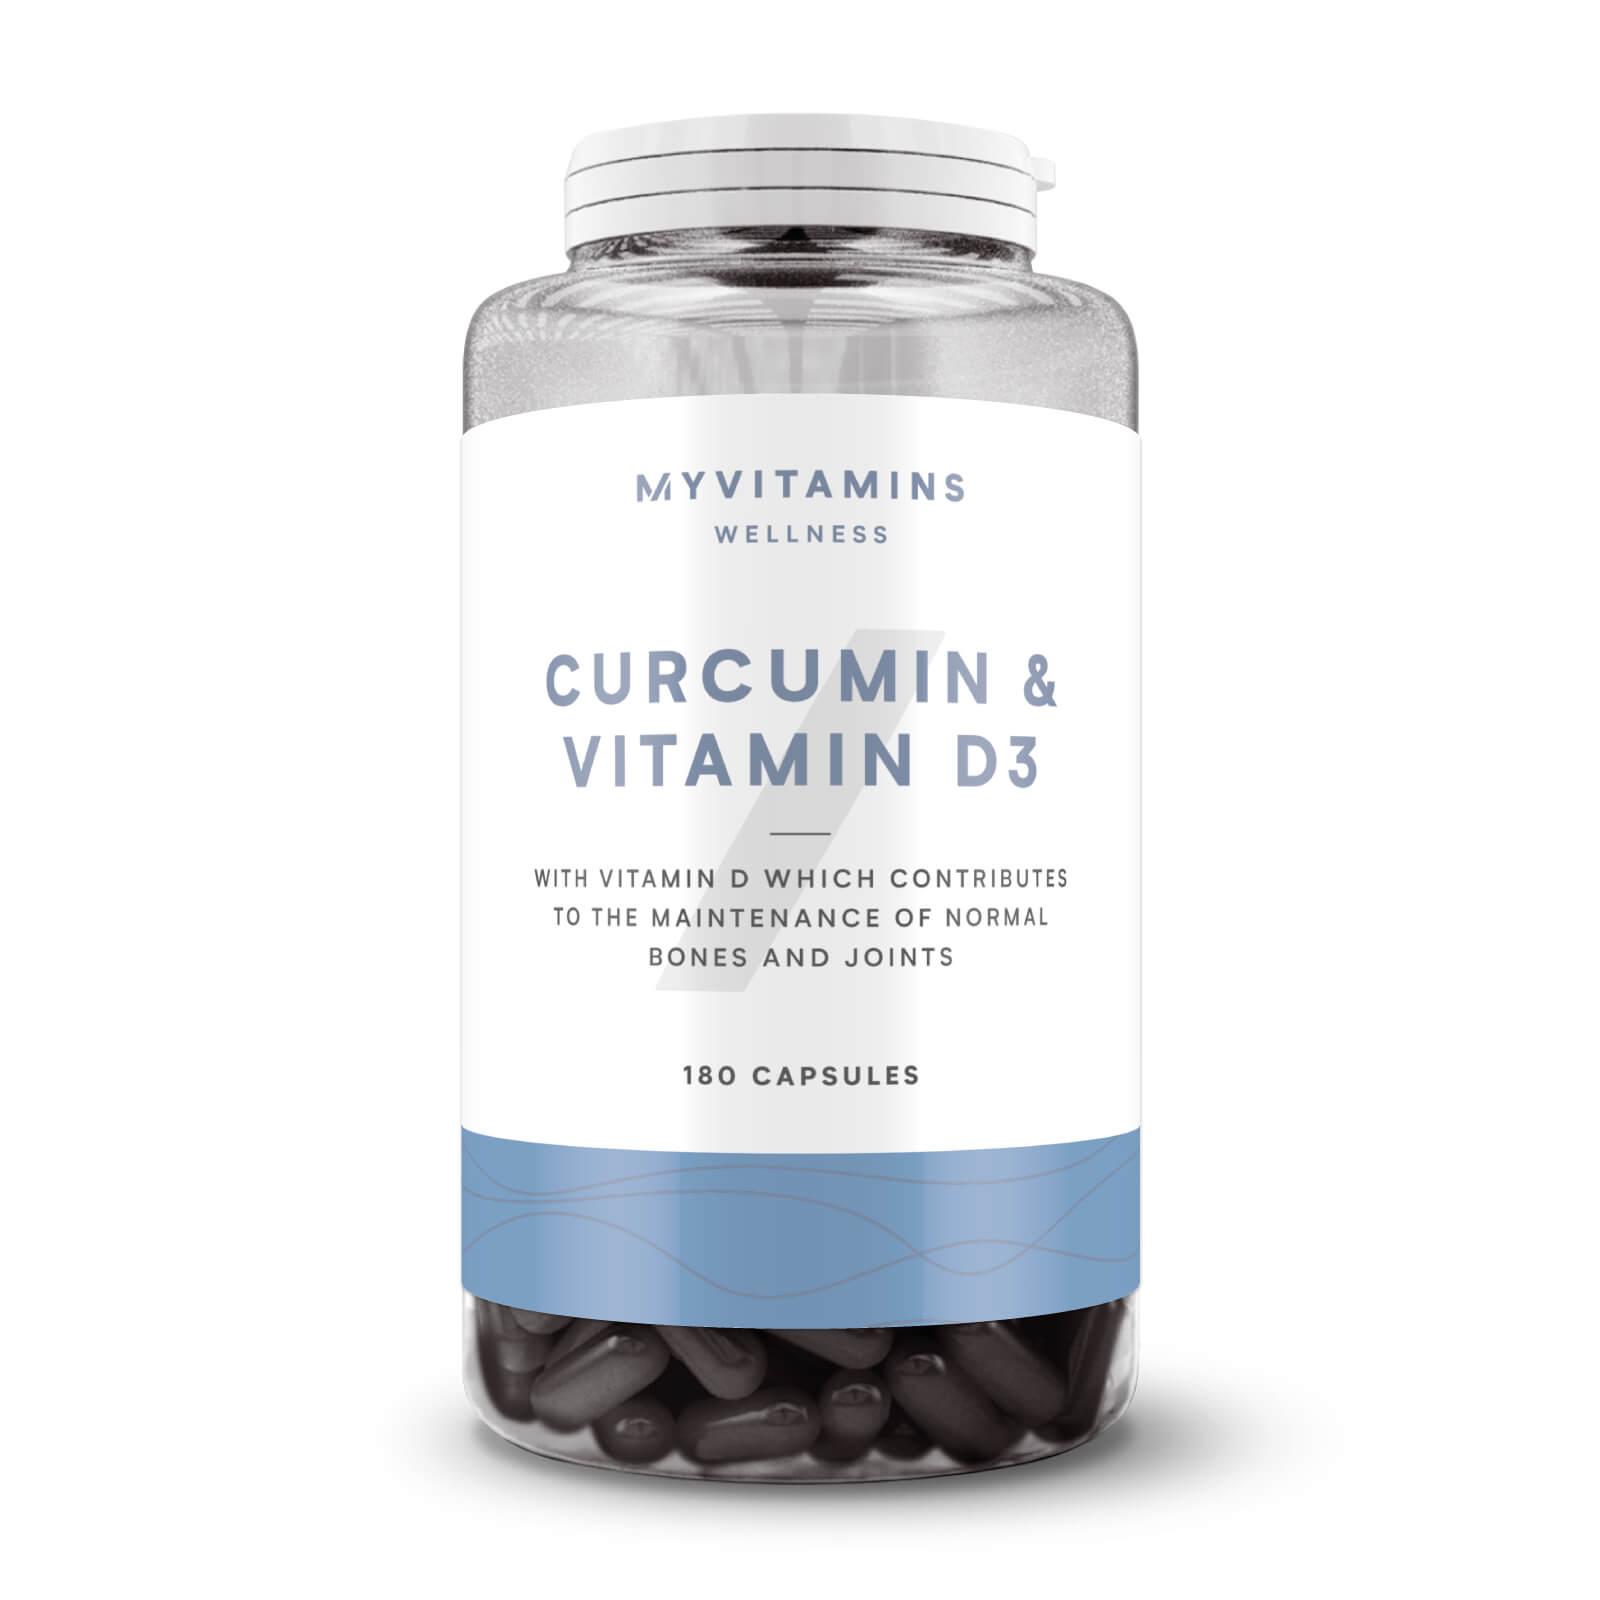 Myvitamins Gélules de Curcumine et Vitamine D - 180Gélules